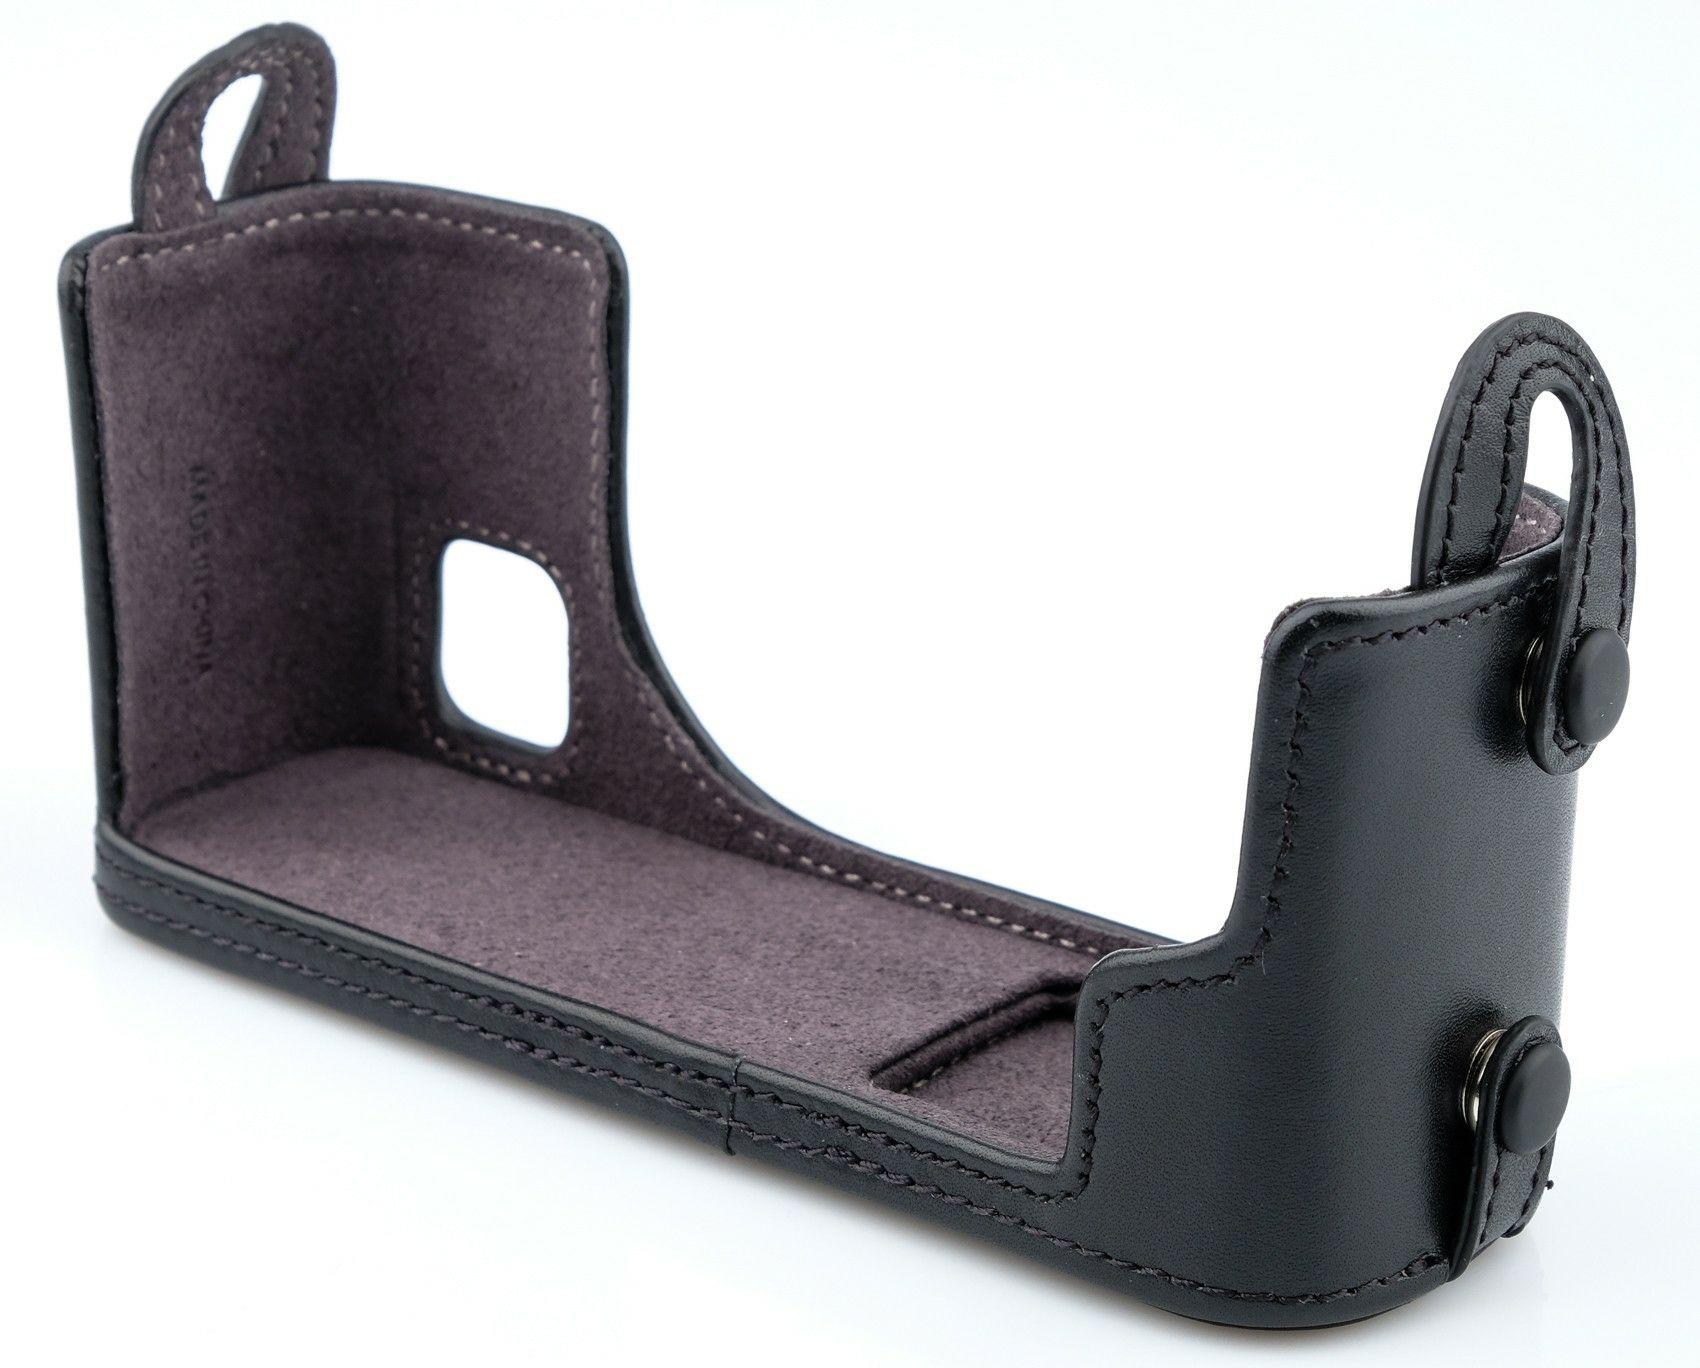 Fujifilm BLC-XPro2 Kameratasche